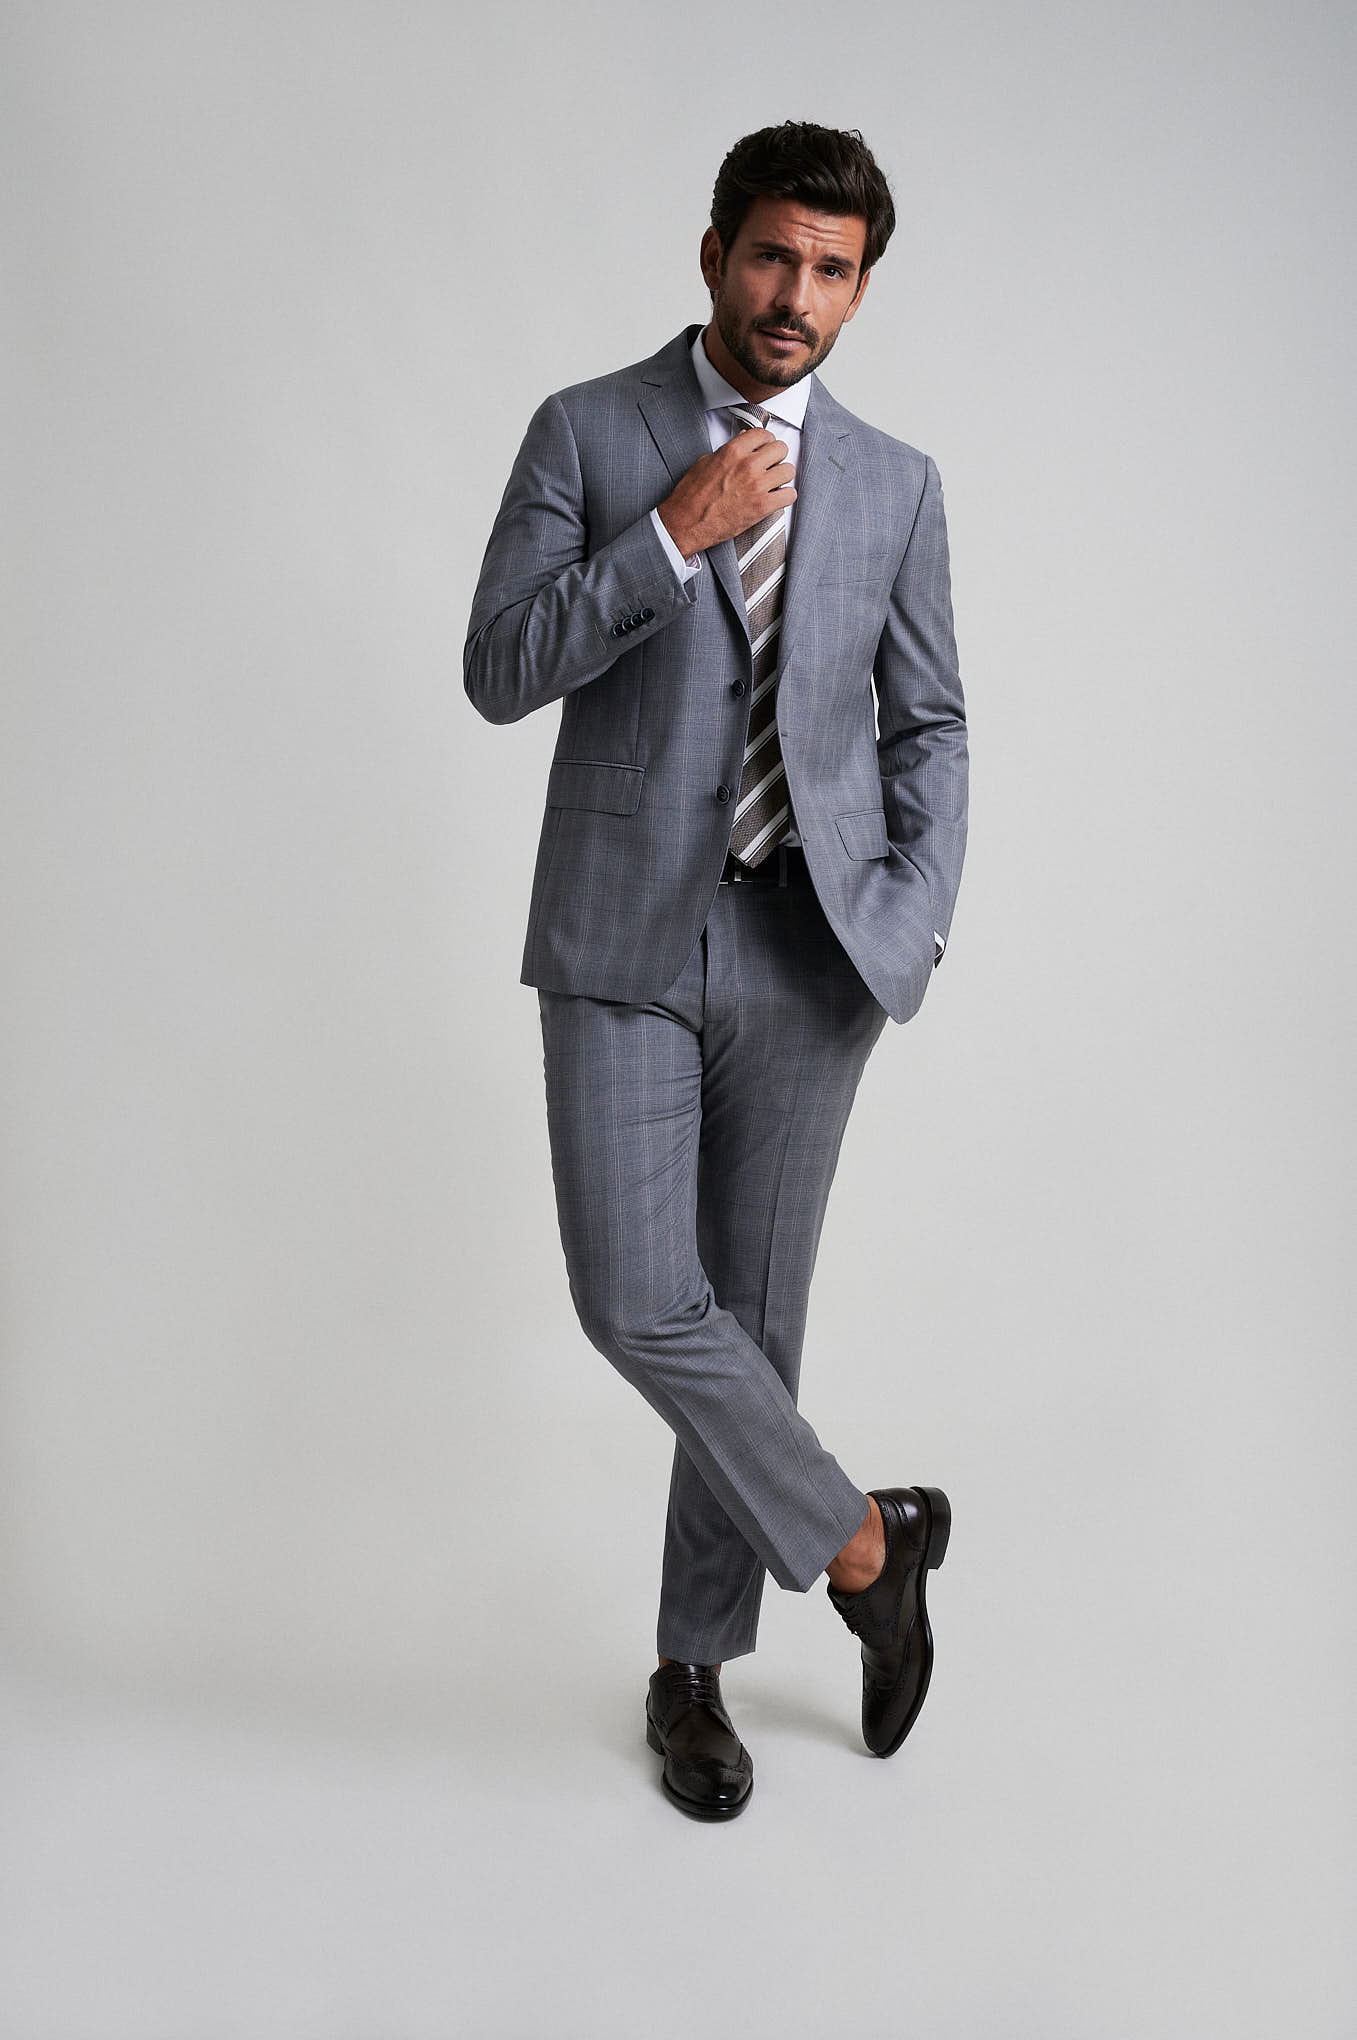 Suit Light Grey Formal Man